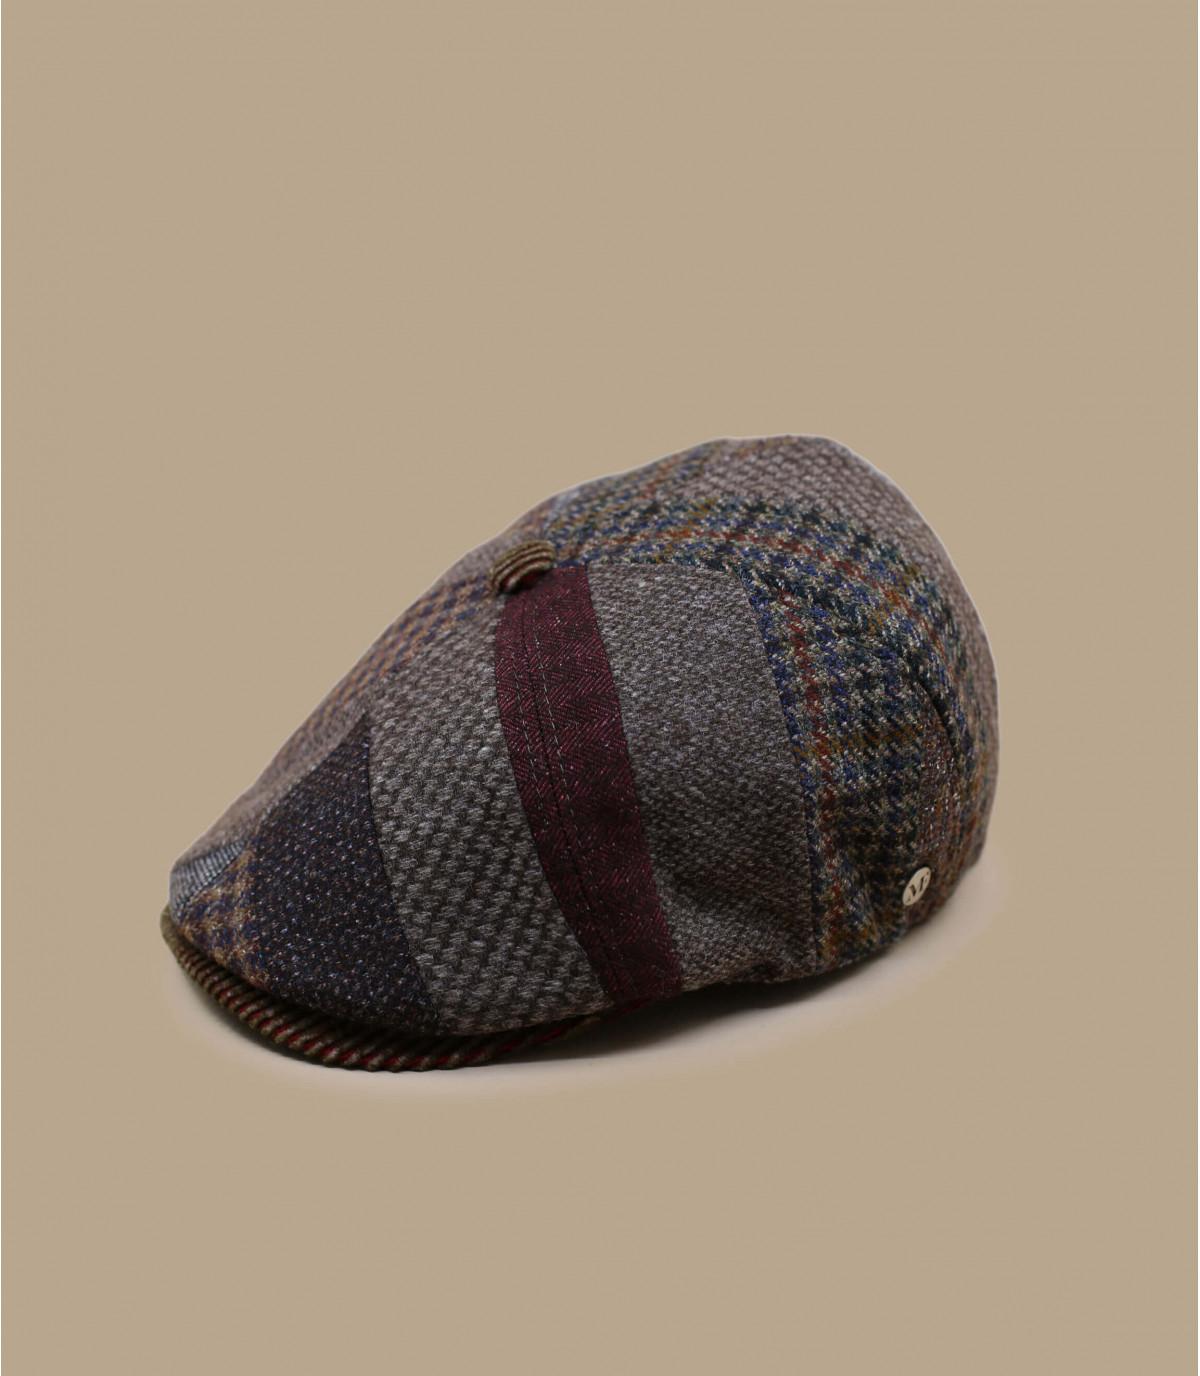 gorra repartidor lana patchwork